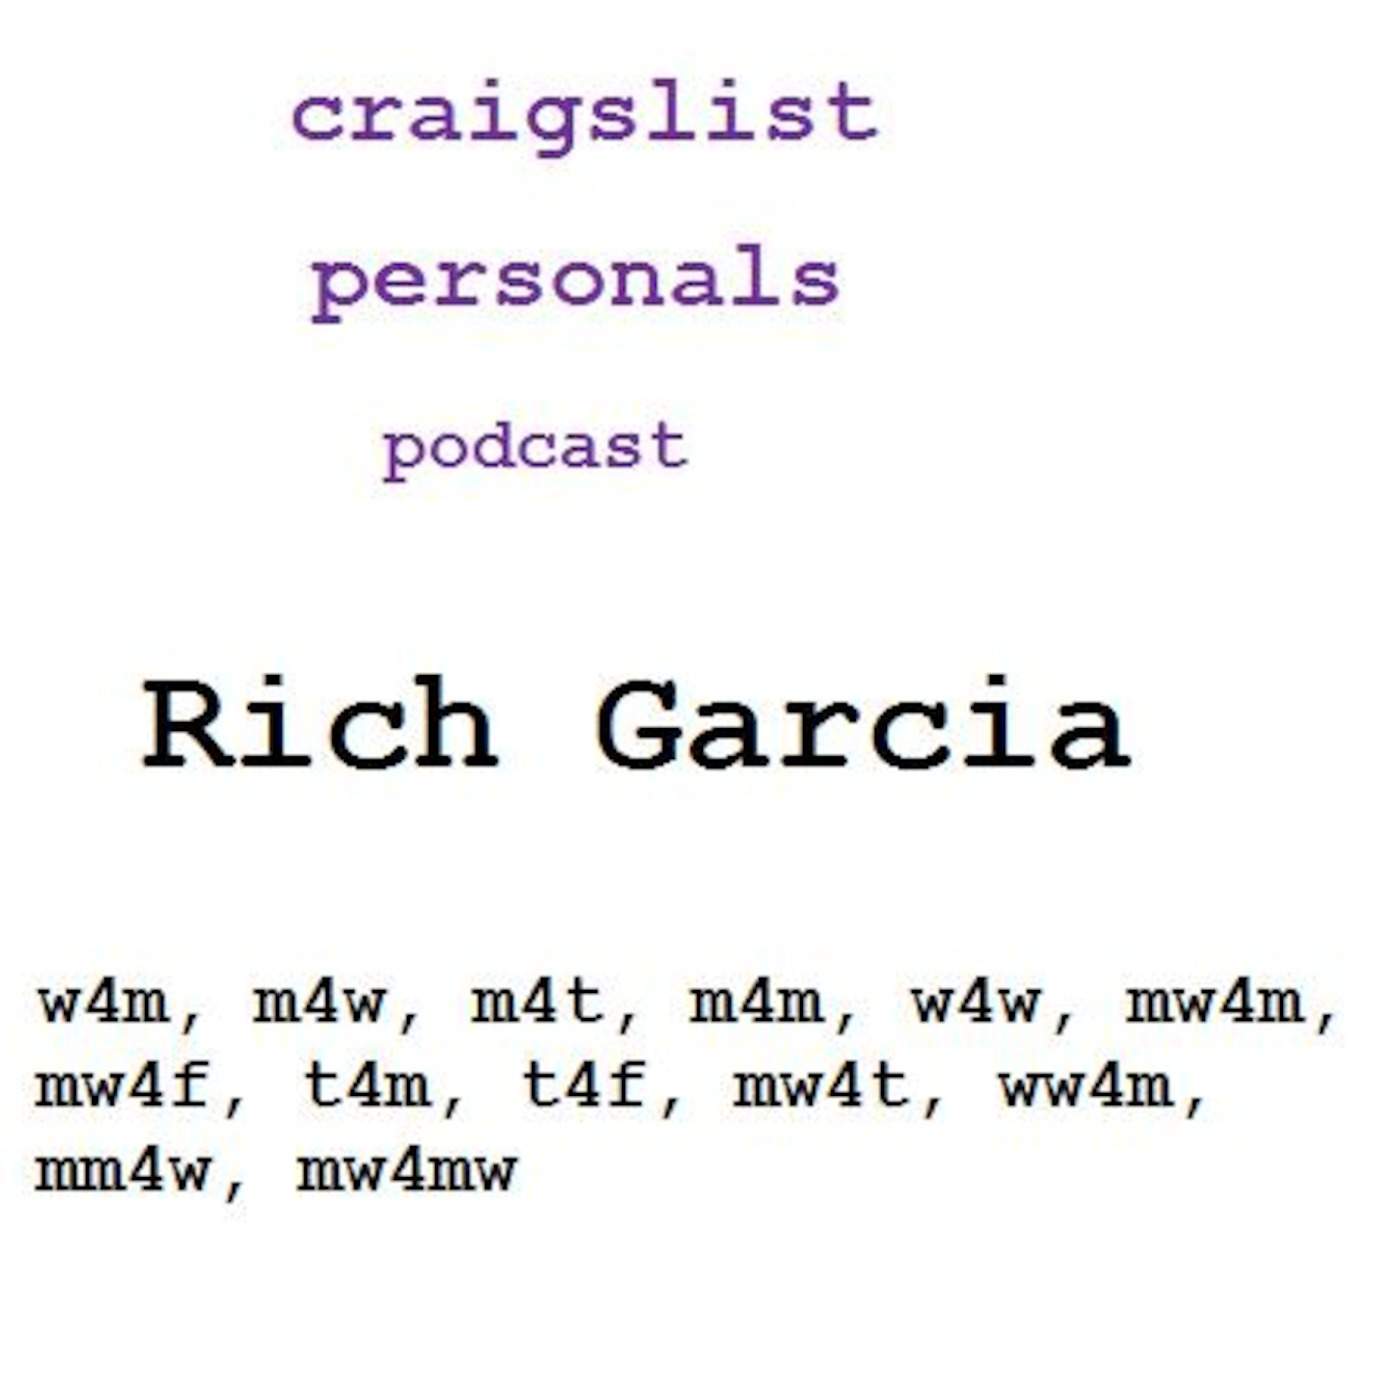 Craigslist personals t4m